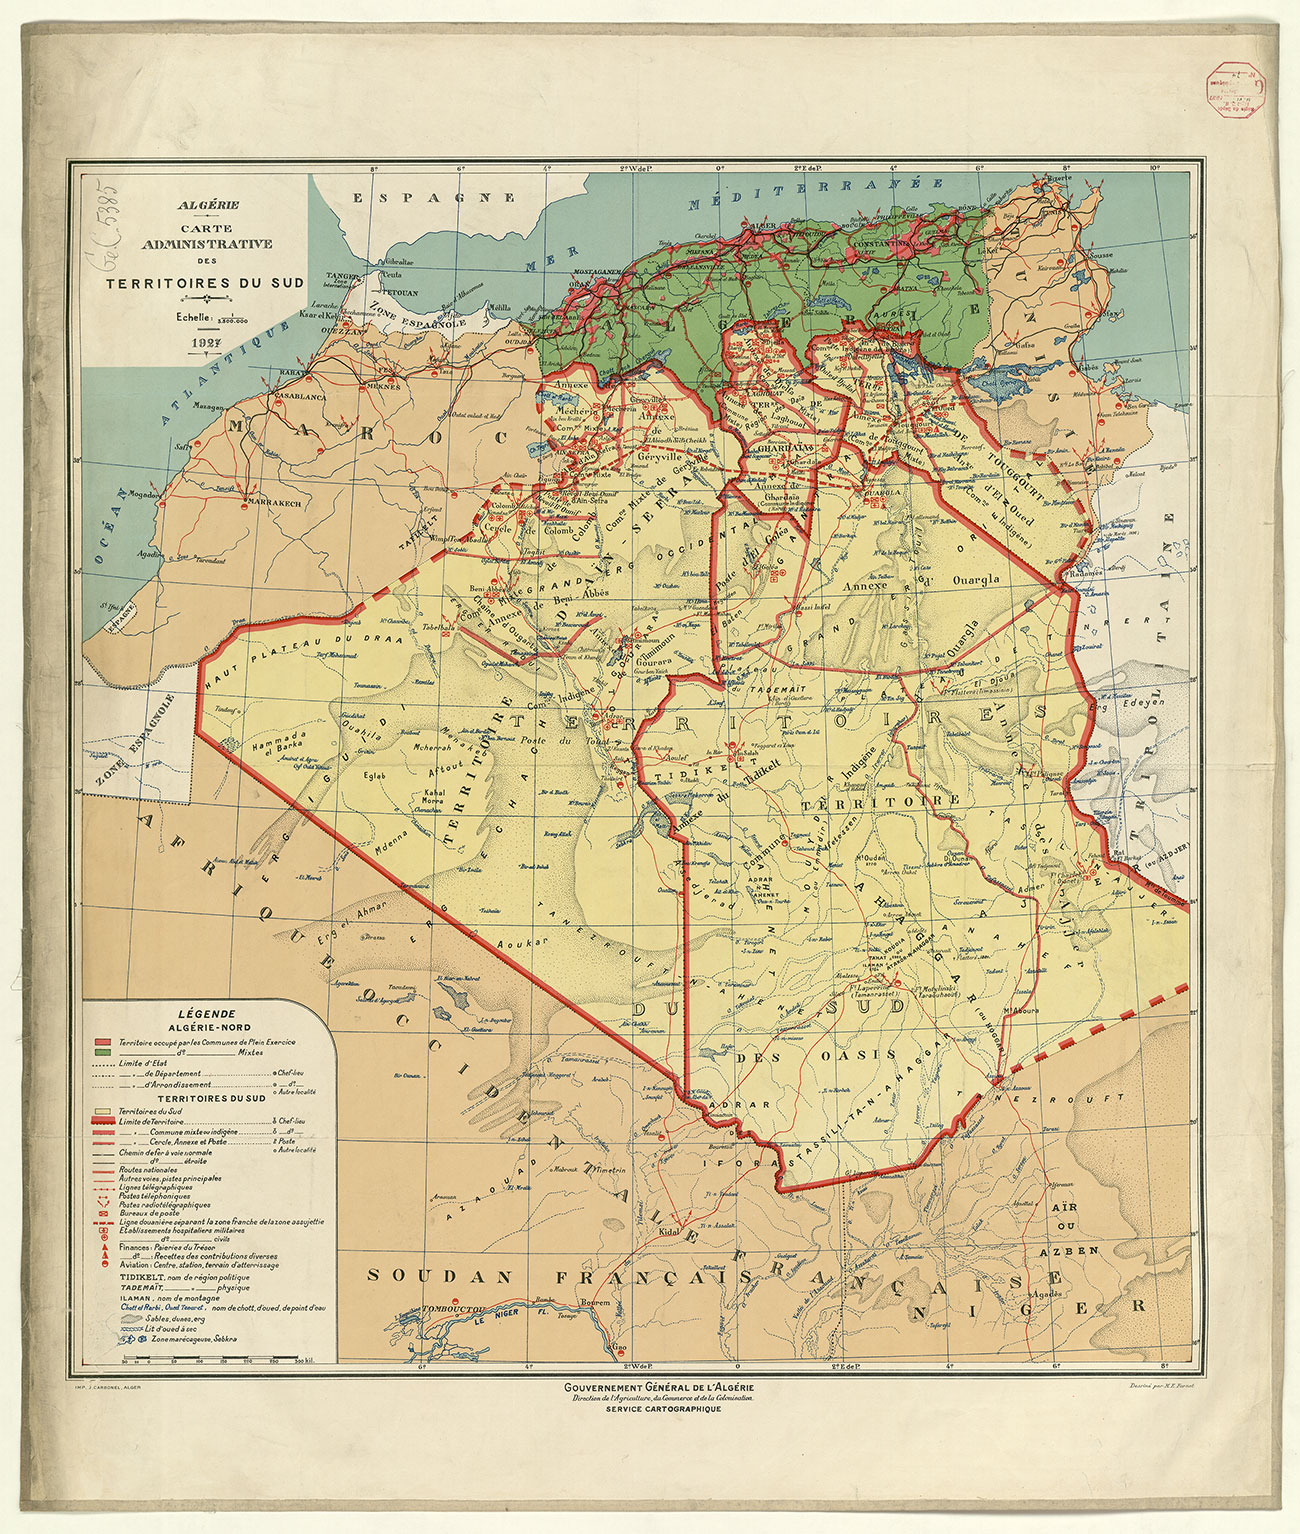 Carte Algerie Population.Made In Algeria Mucem